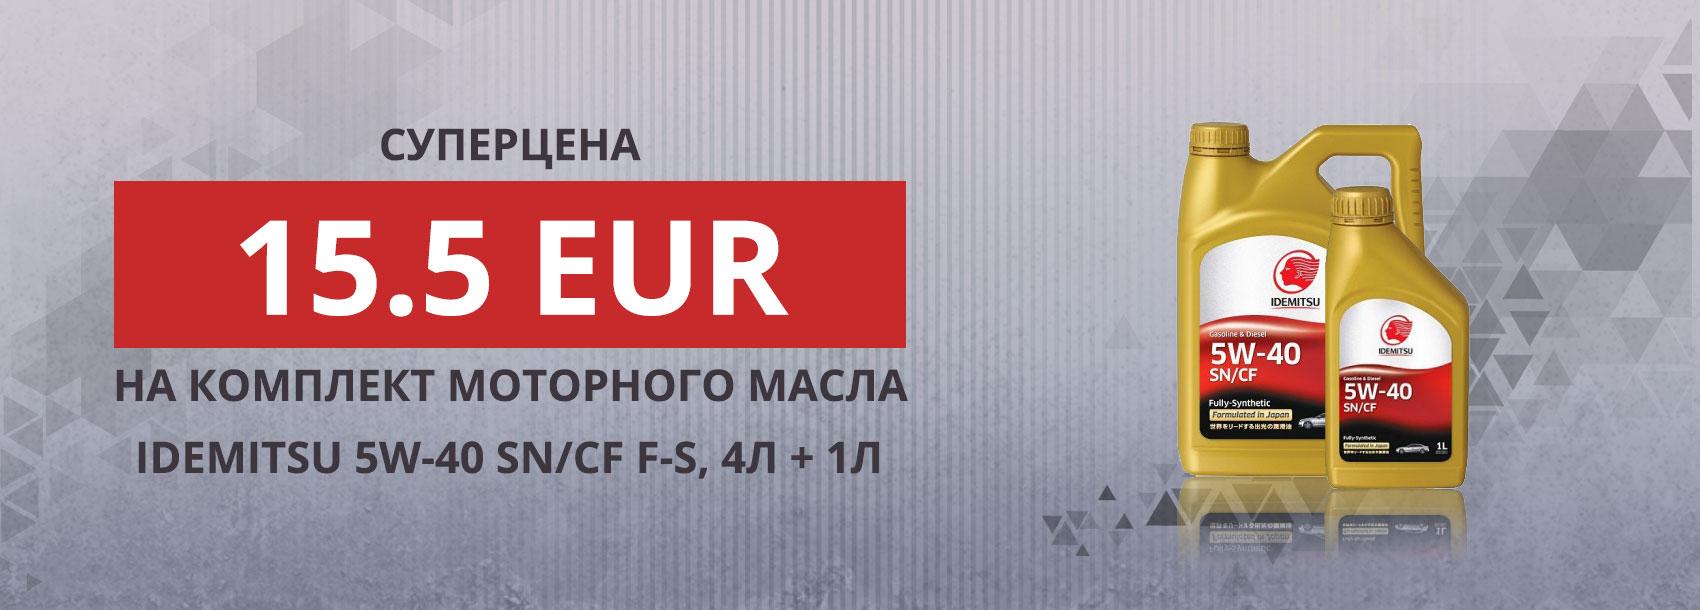 Суперцена 15.5 EUR на комплект моторного масла Idemitsu